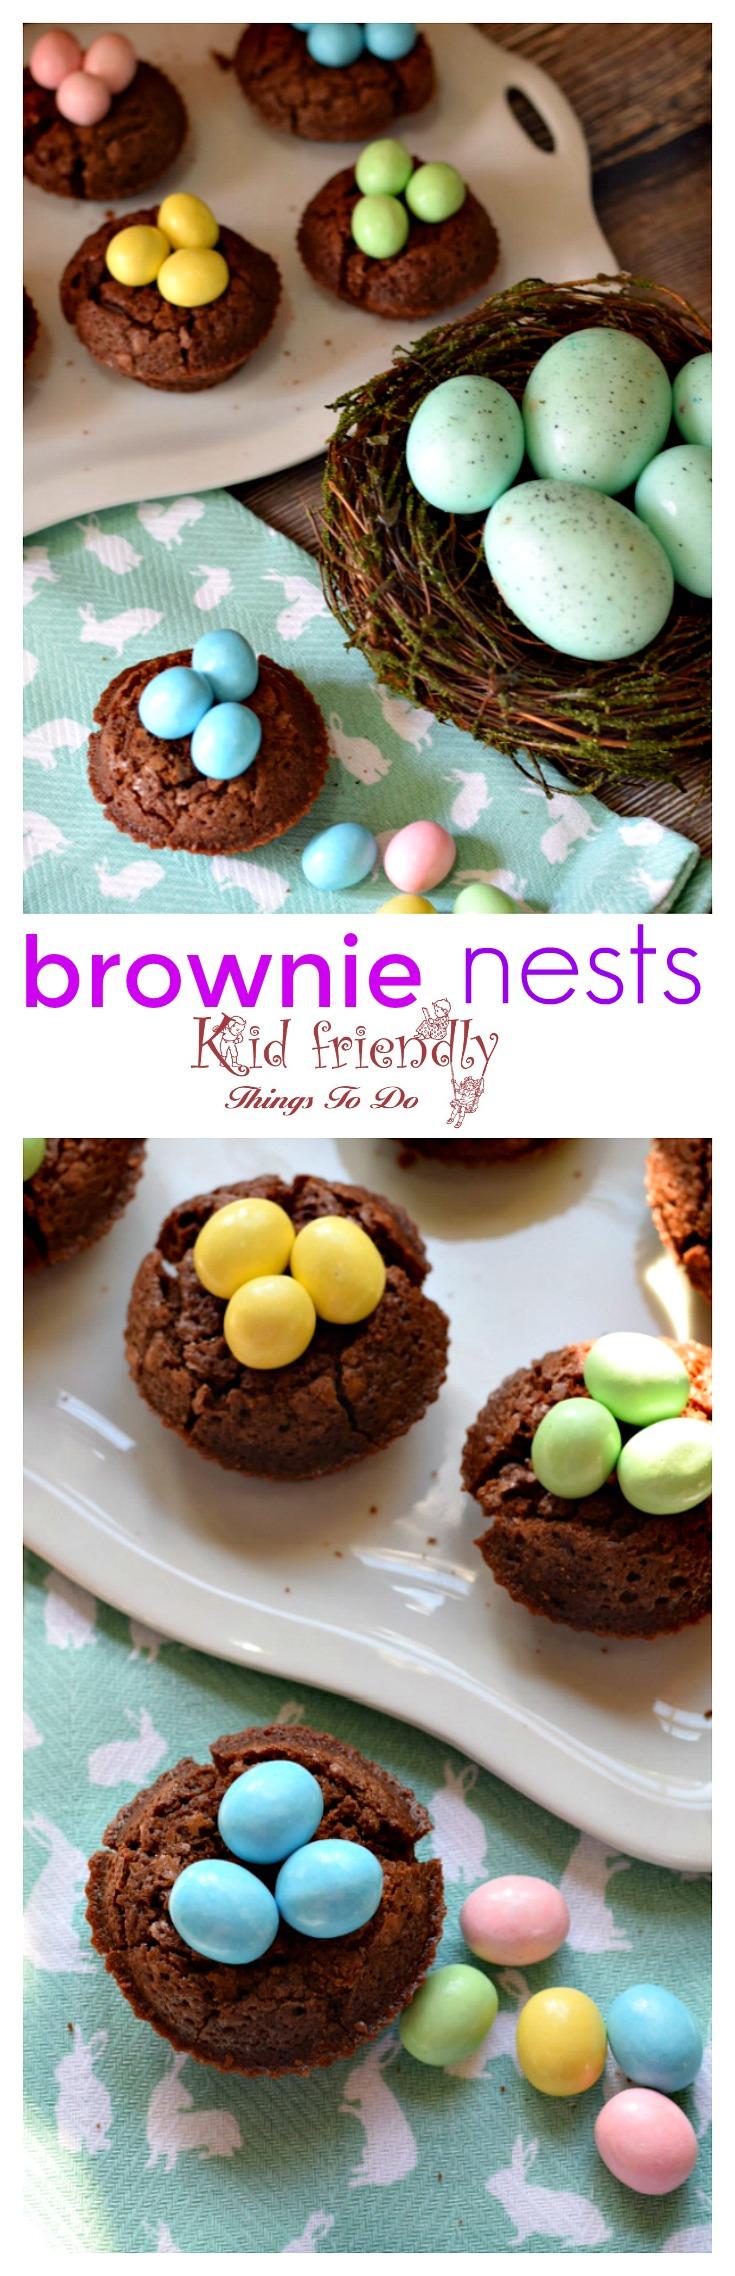 Easy to make Brownie Bird Nest for a spring or Easter kid friendly treat - great dessert for Easter www.kidfriendlyhthingstodo.com